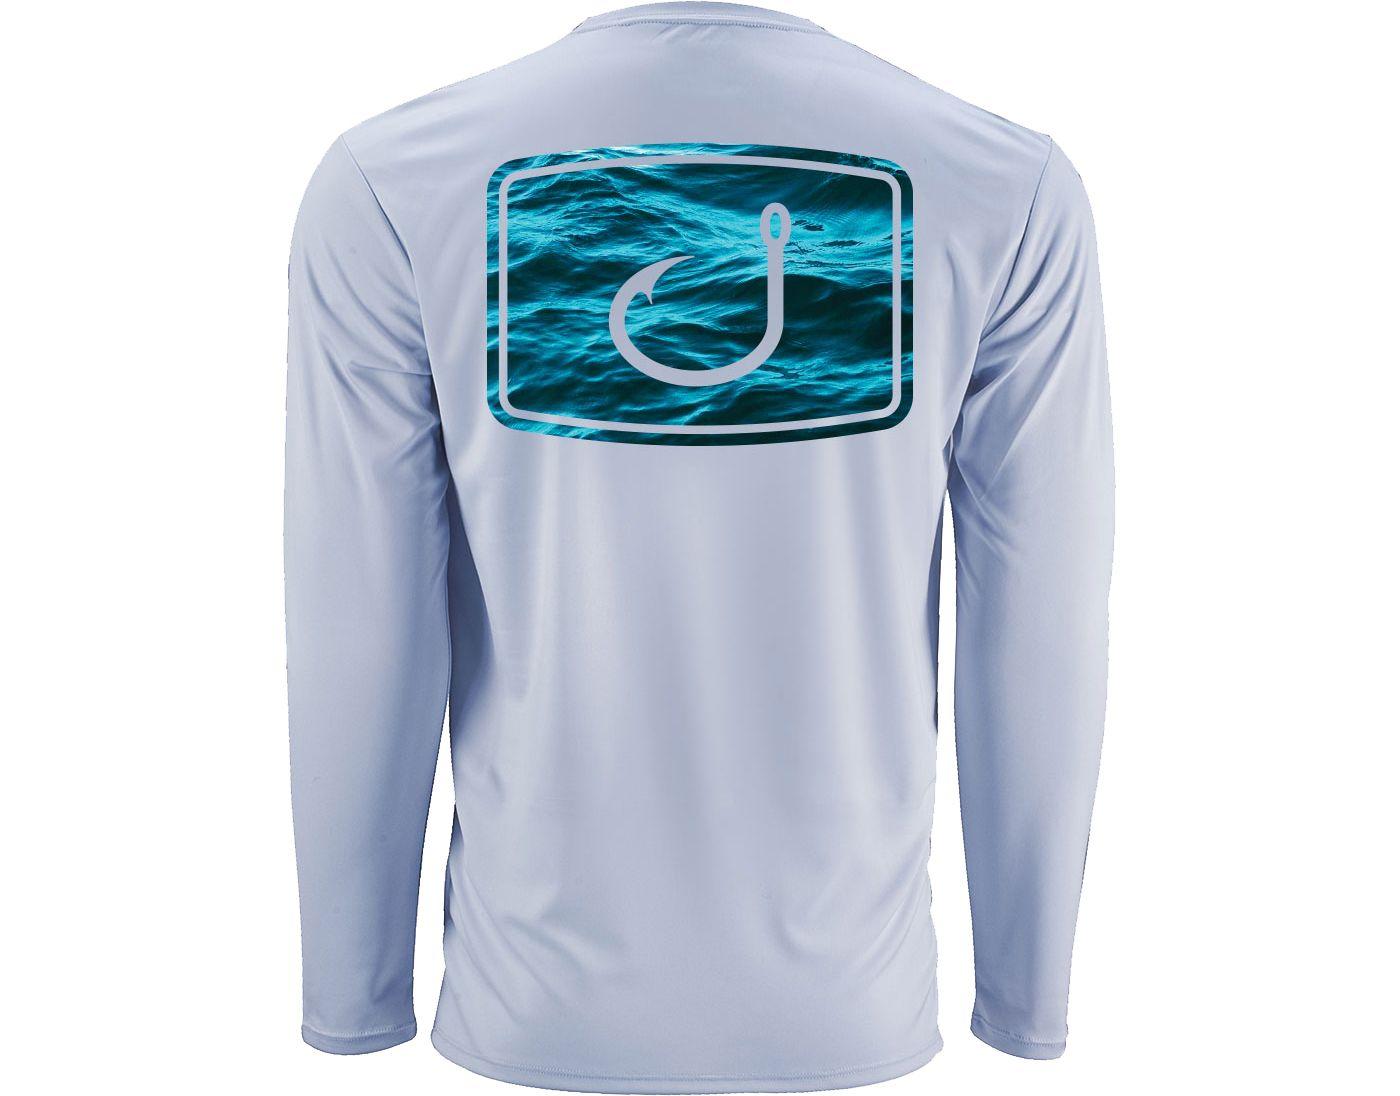 AVID Men's Water Camo AVIDry Long Sleeve Performance Shirt